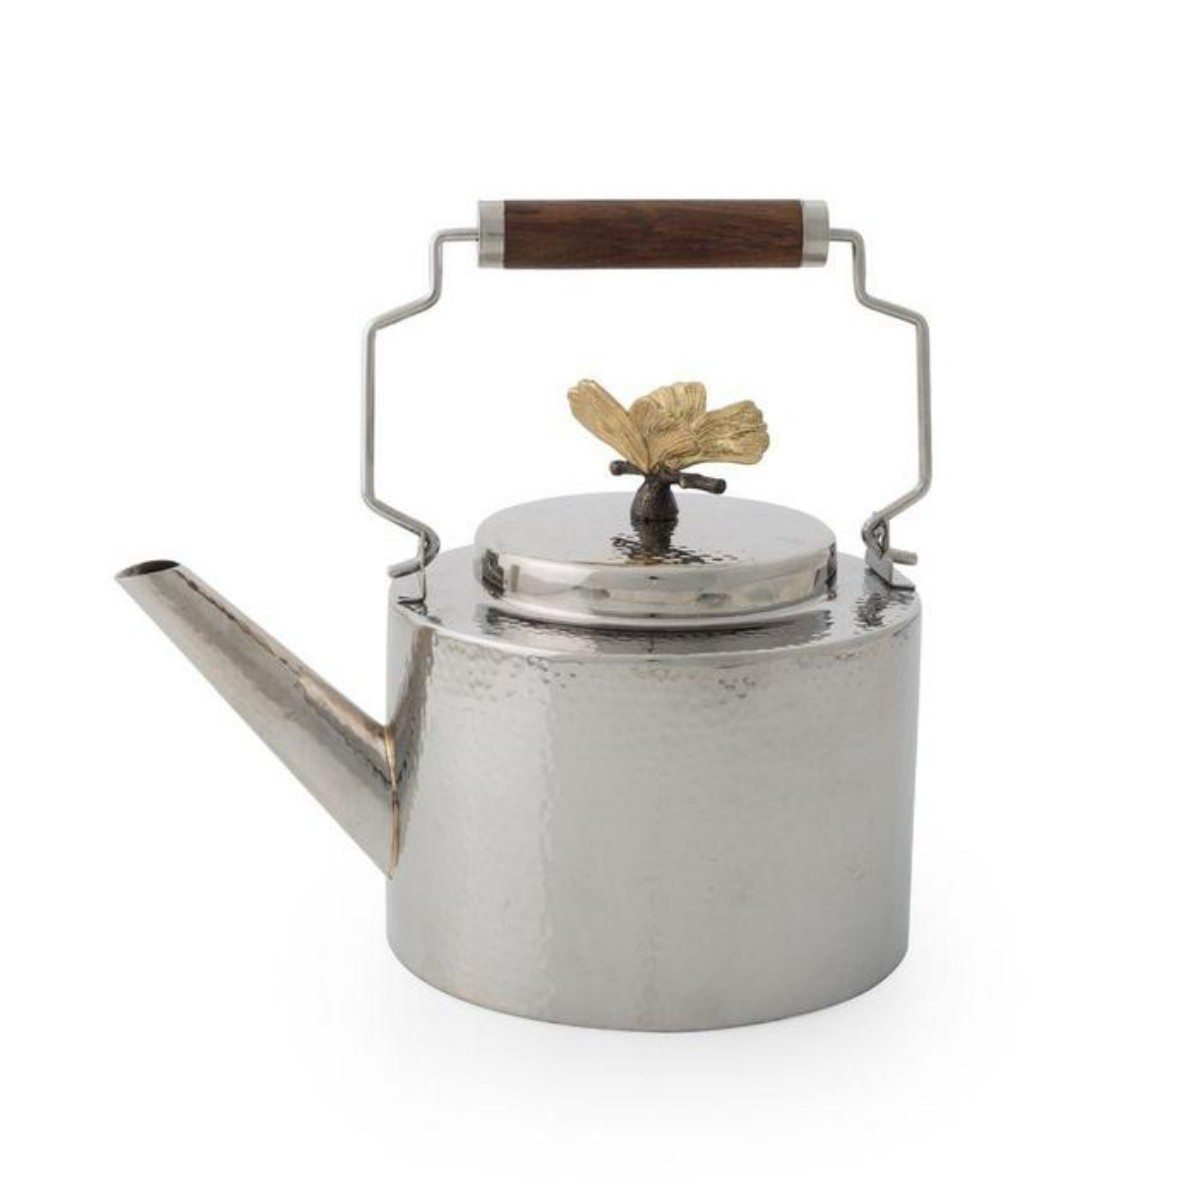 Michael Aram I Butterfly Ginkgo Teapot